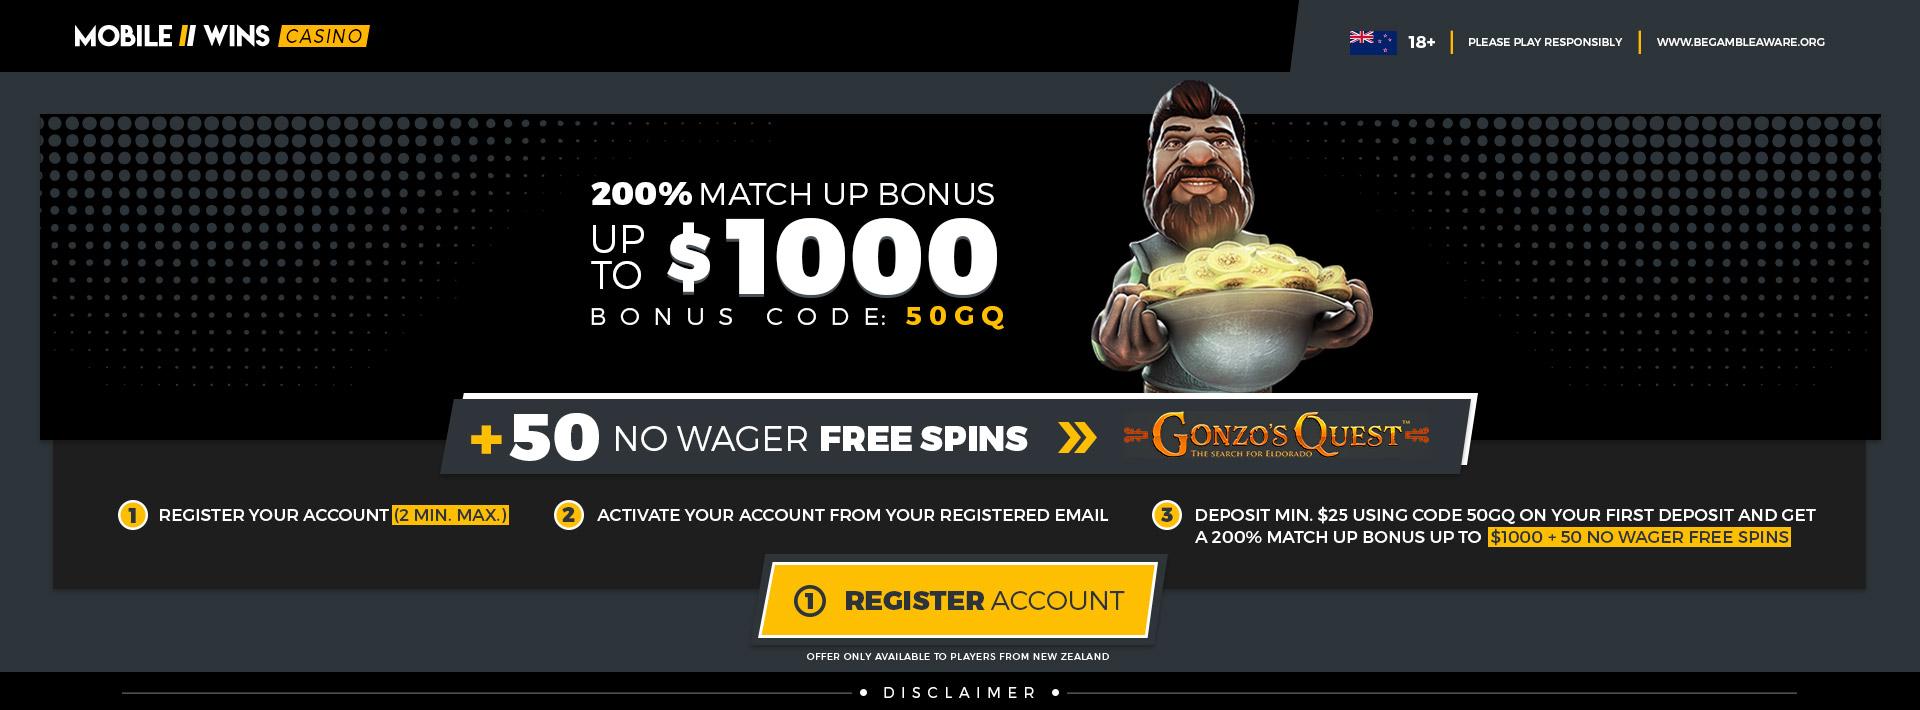 $1000 Bonus + 50 Free Spins